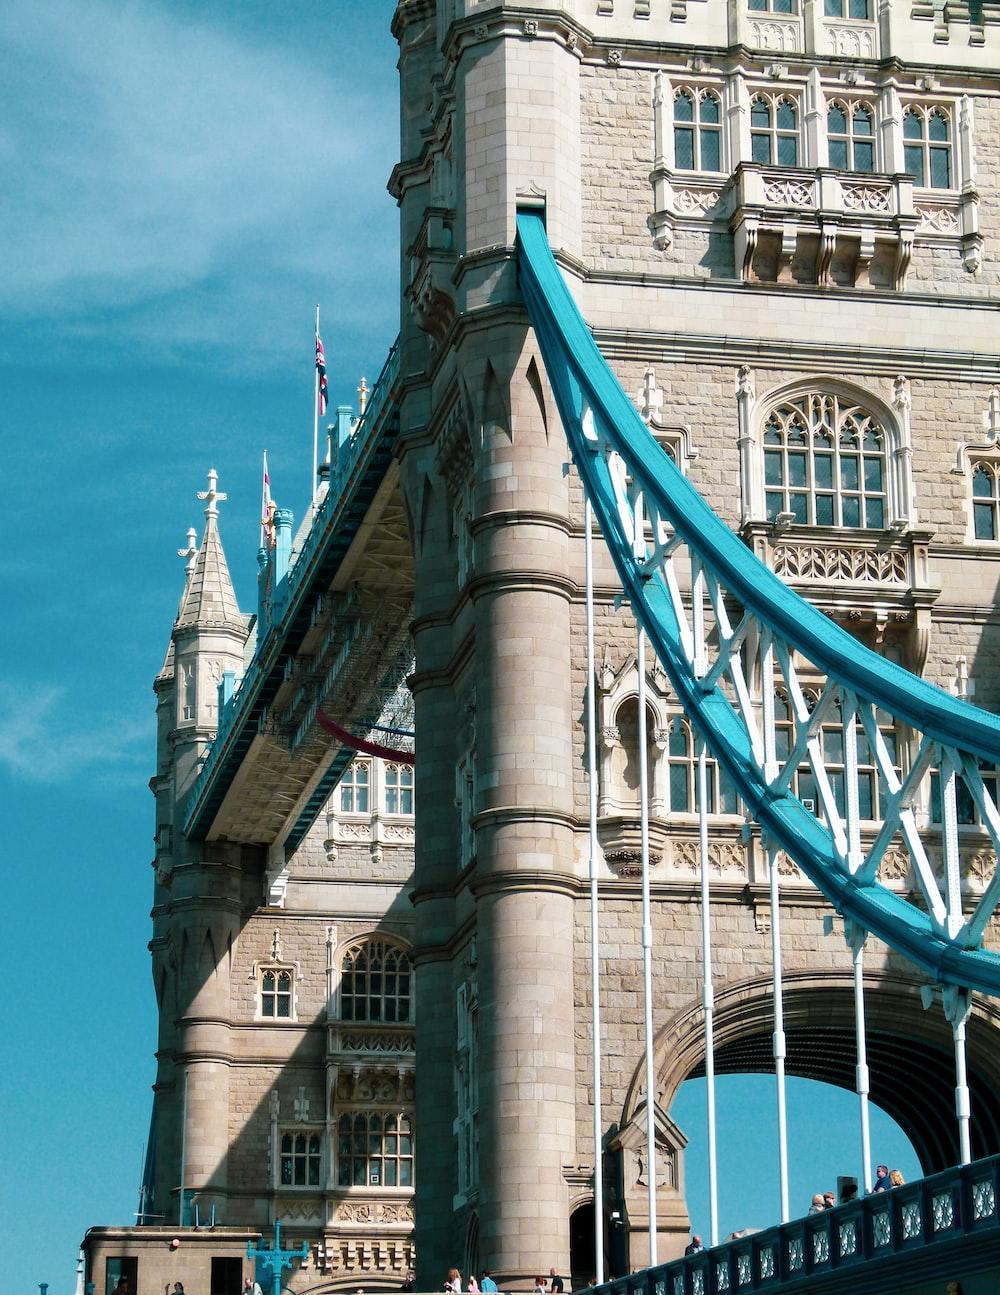 blue and white suspension bridge